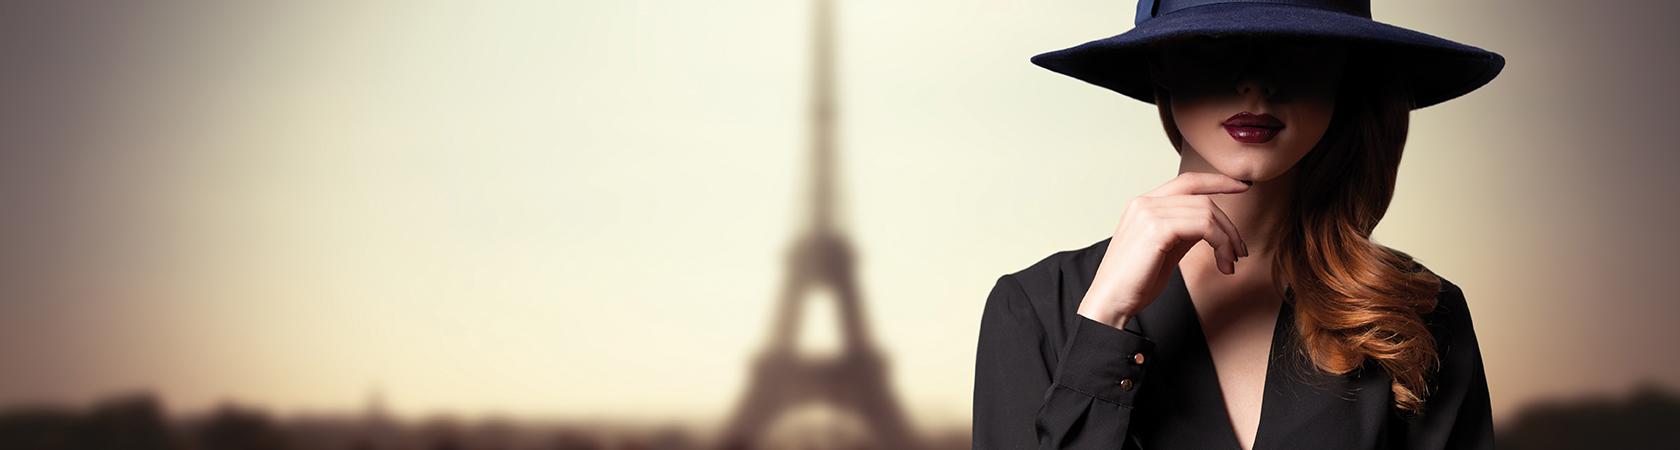 Programme - MBA Luxury Communication & Strategies EFAP Paris Full-Time